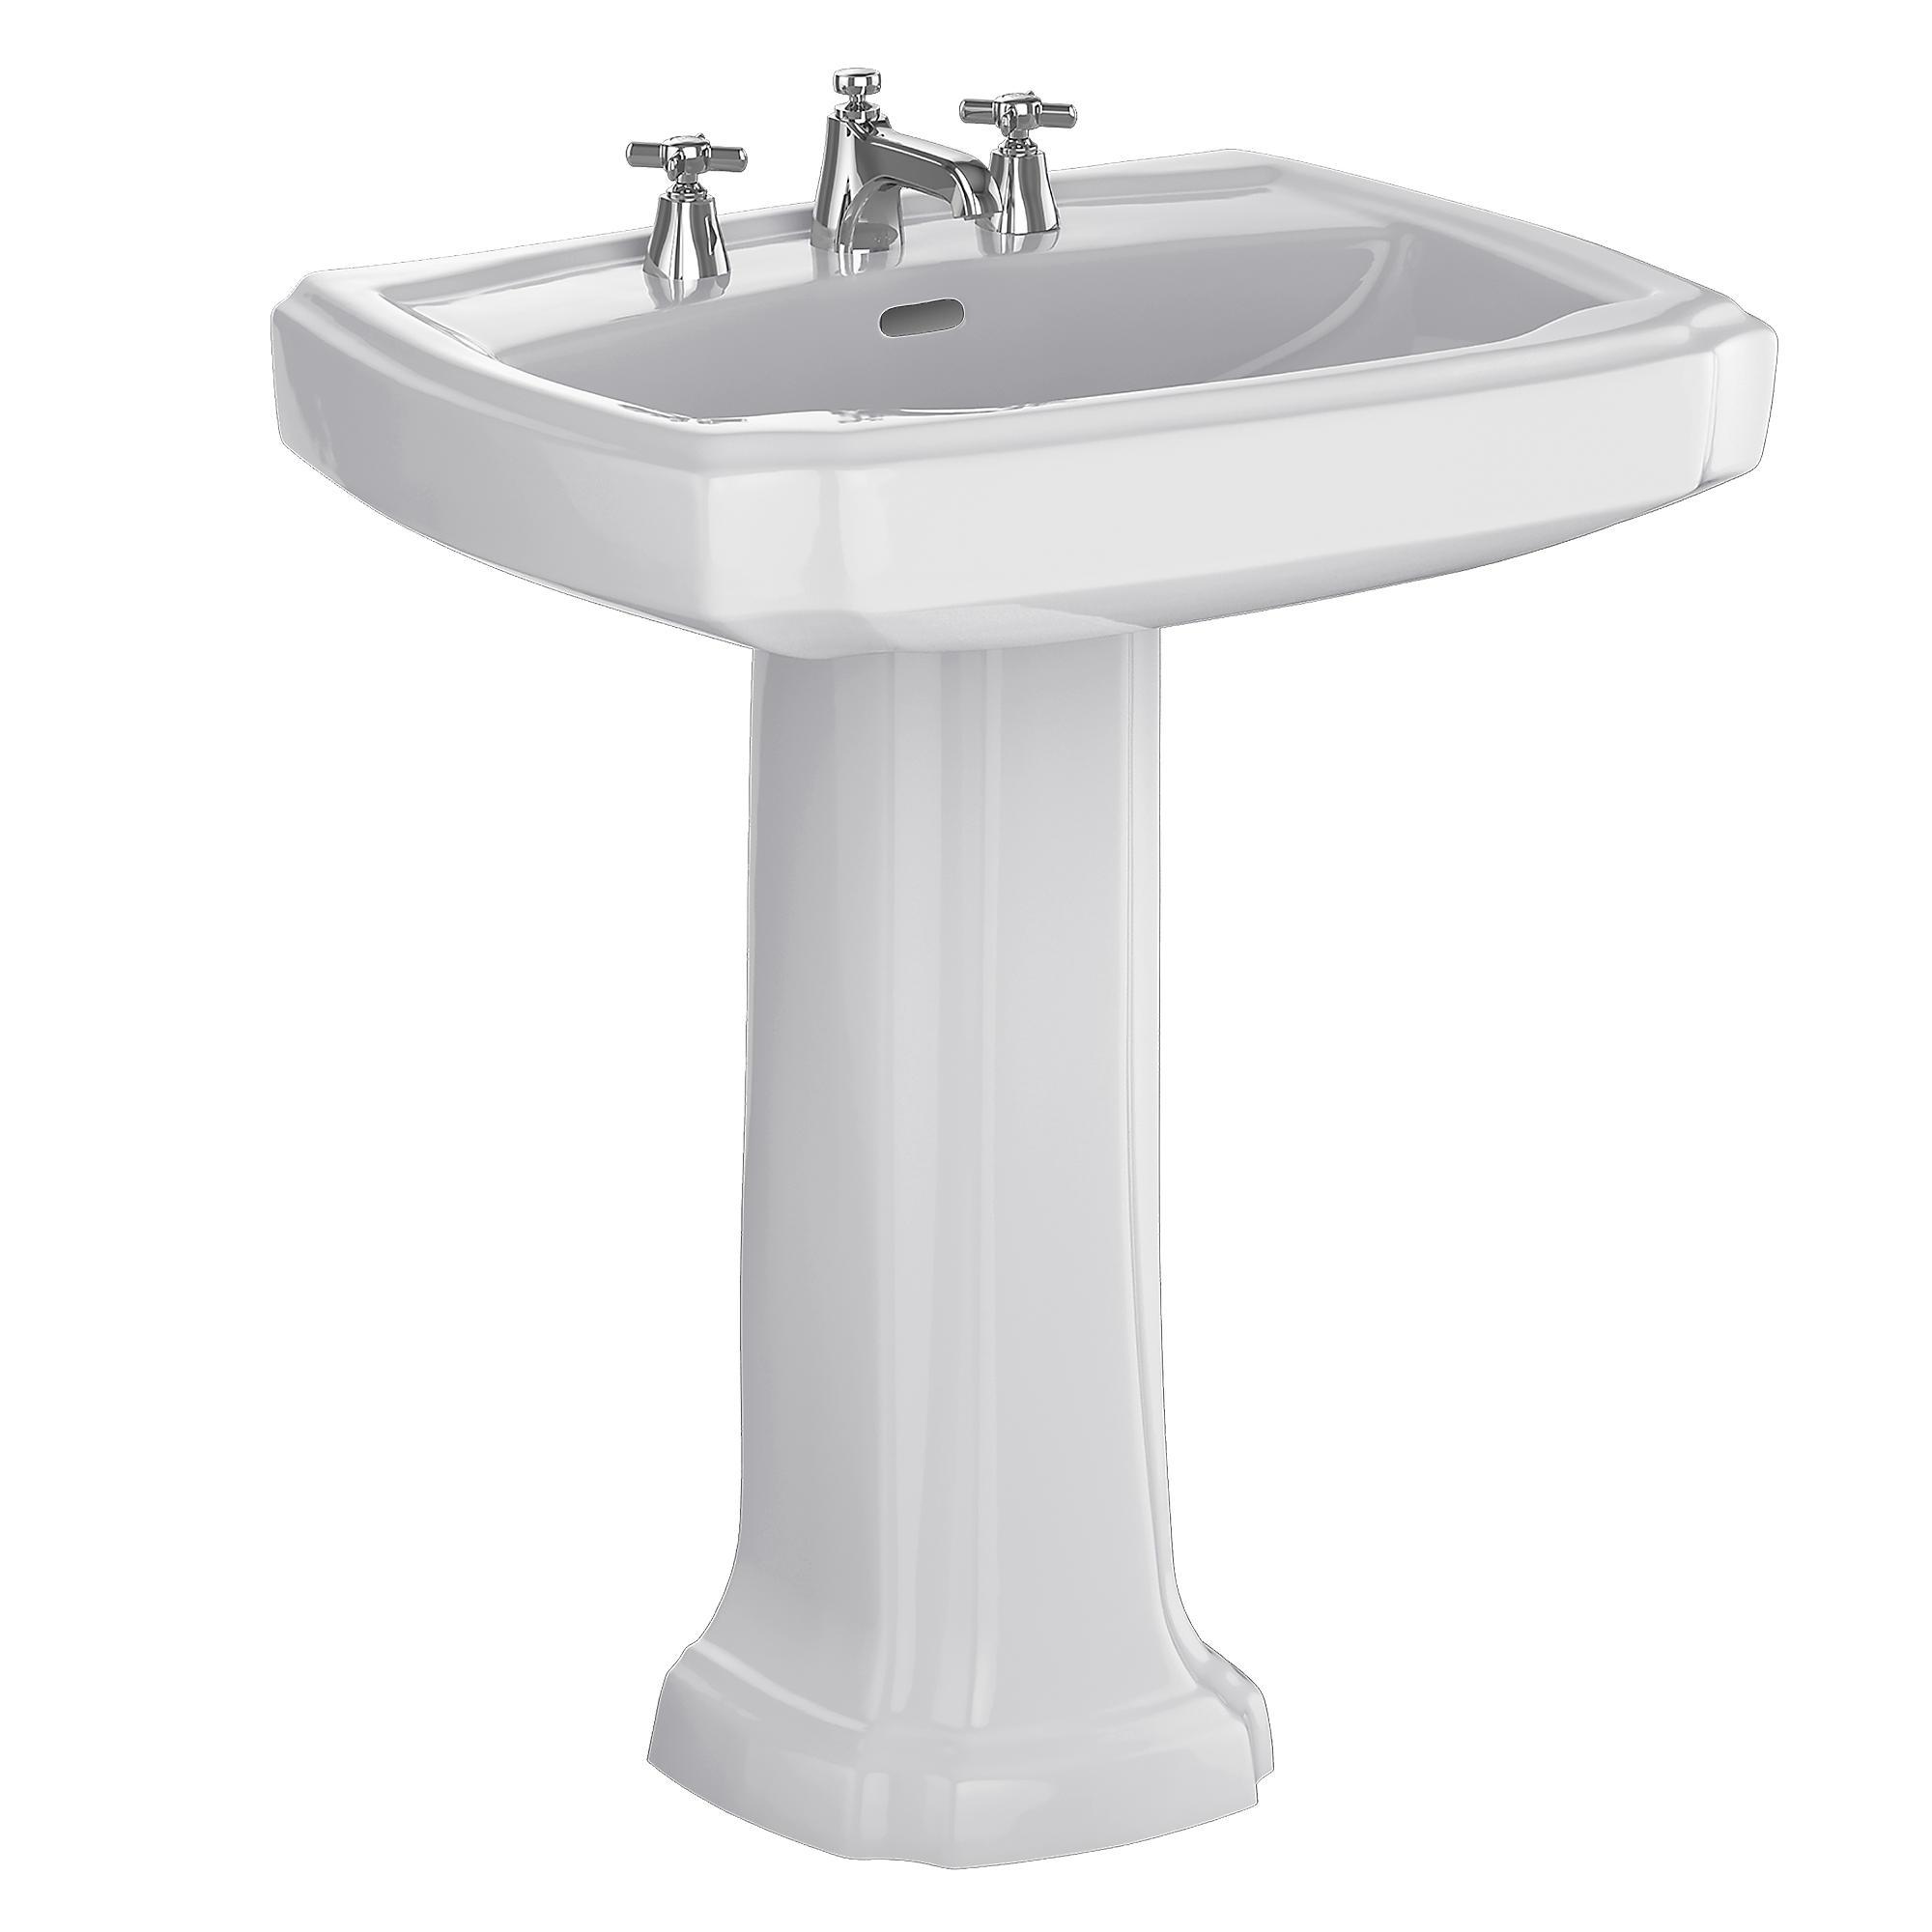 Lpt970 11 guinevere  27  pedestal lavatory 0